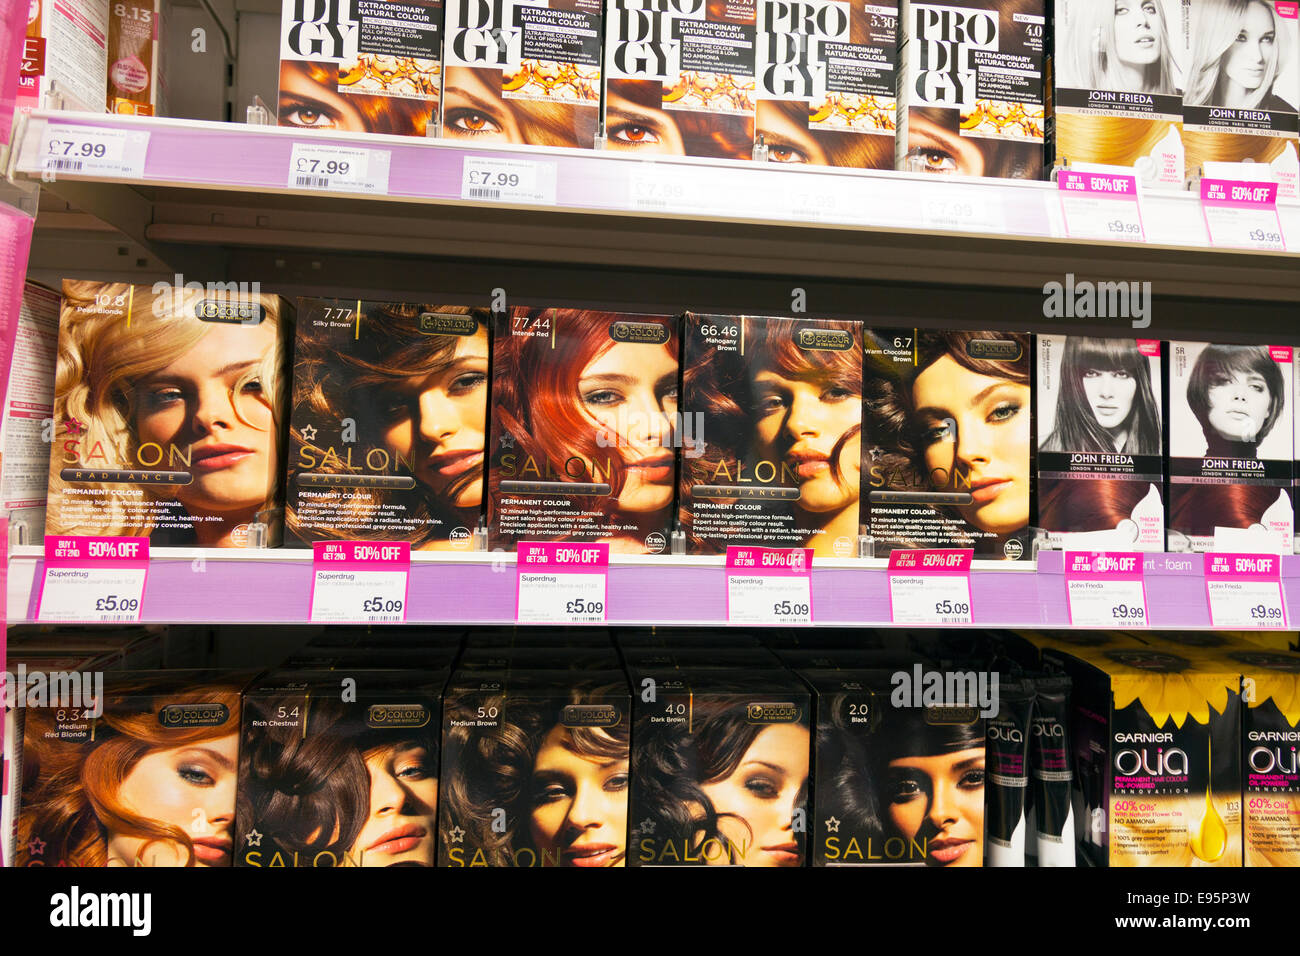 Salon hair dye boxes John Frieda product products on shelf at chemist Chemists shop store - Stock Image